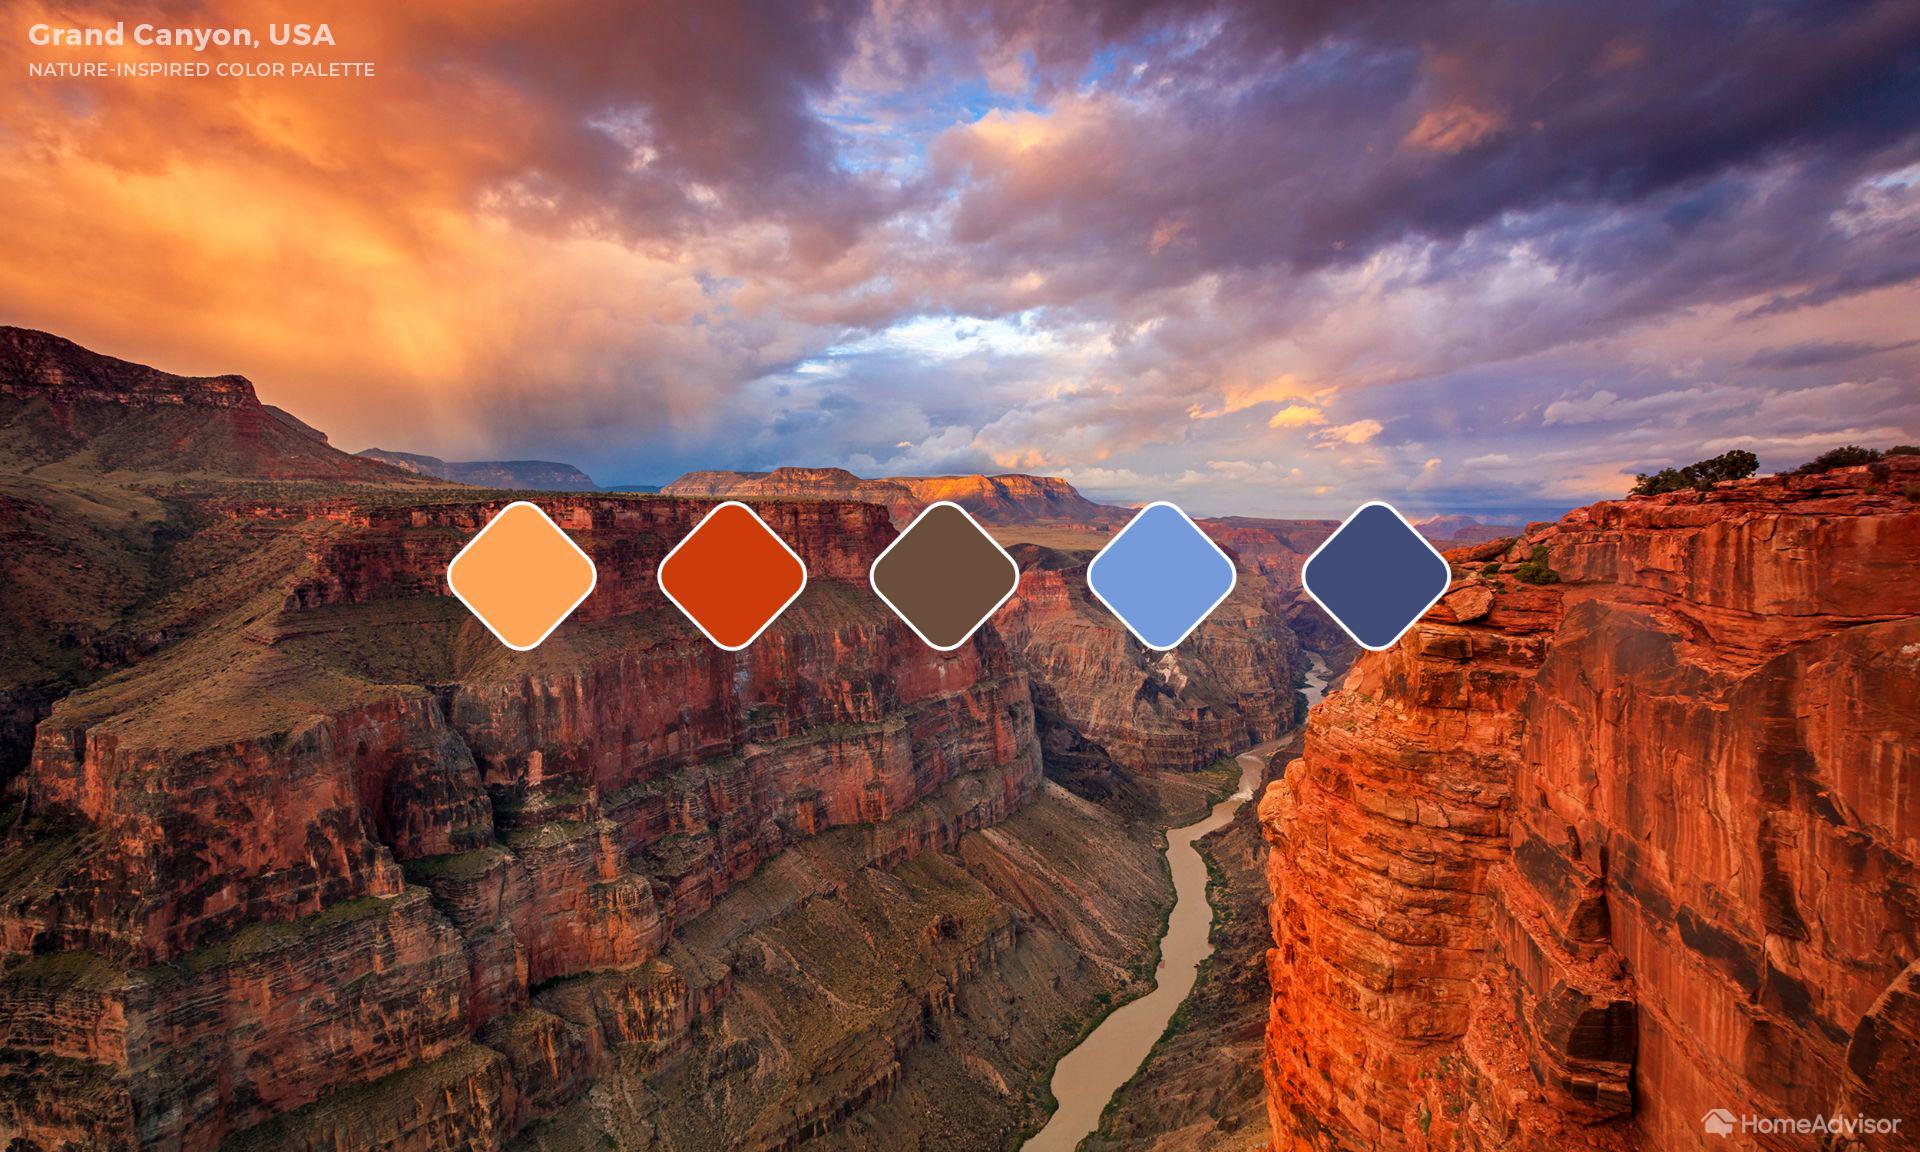 1. Grand Canyon (Arizona, USA)